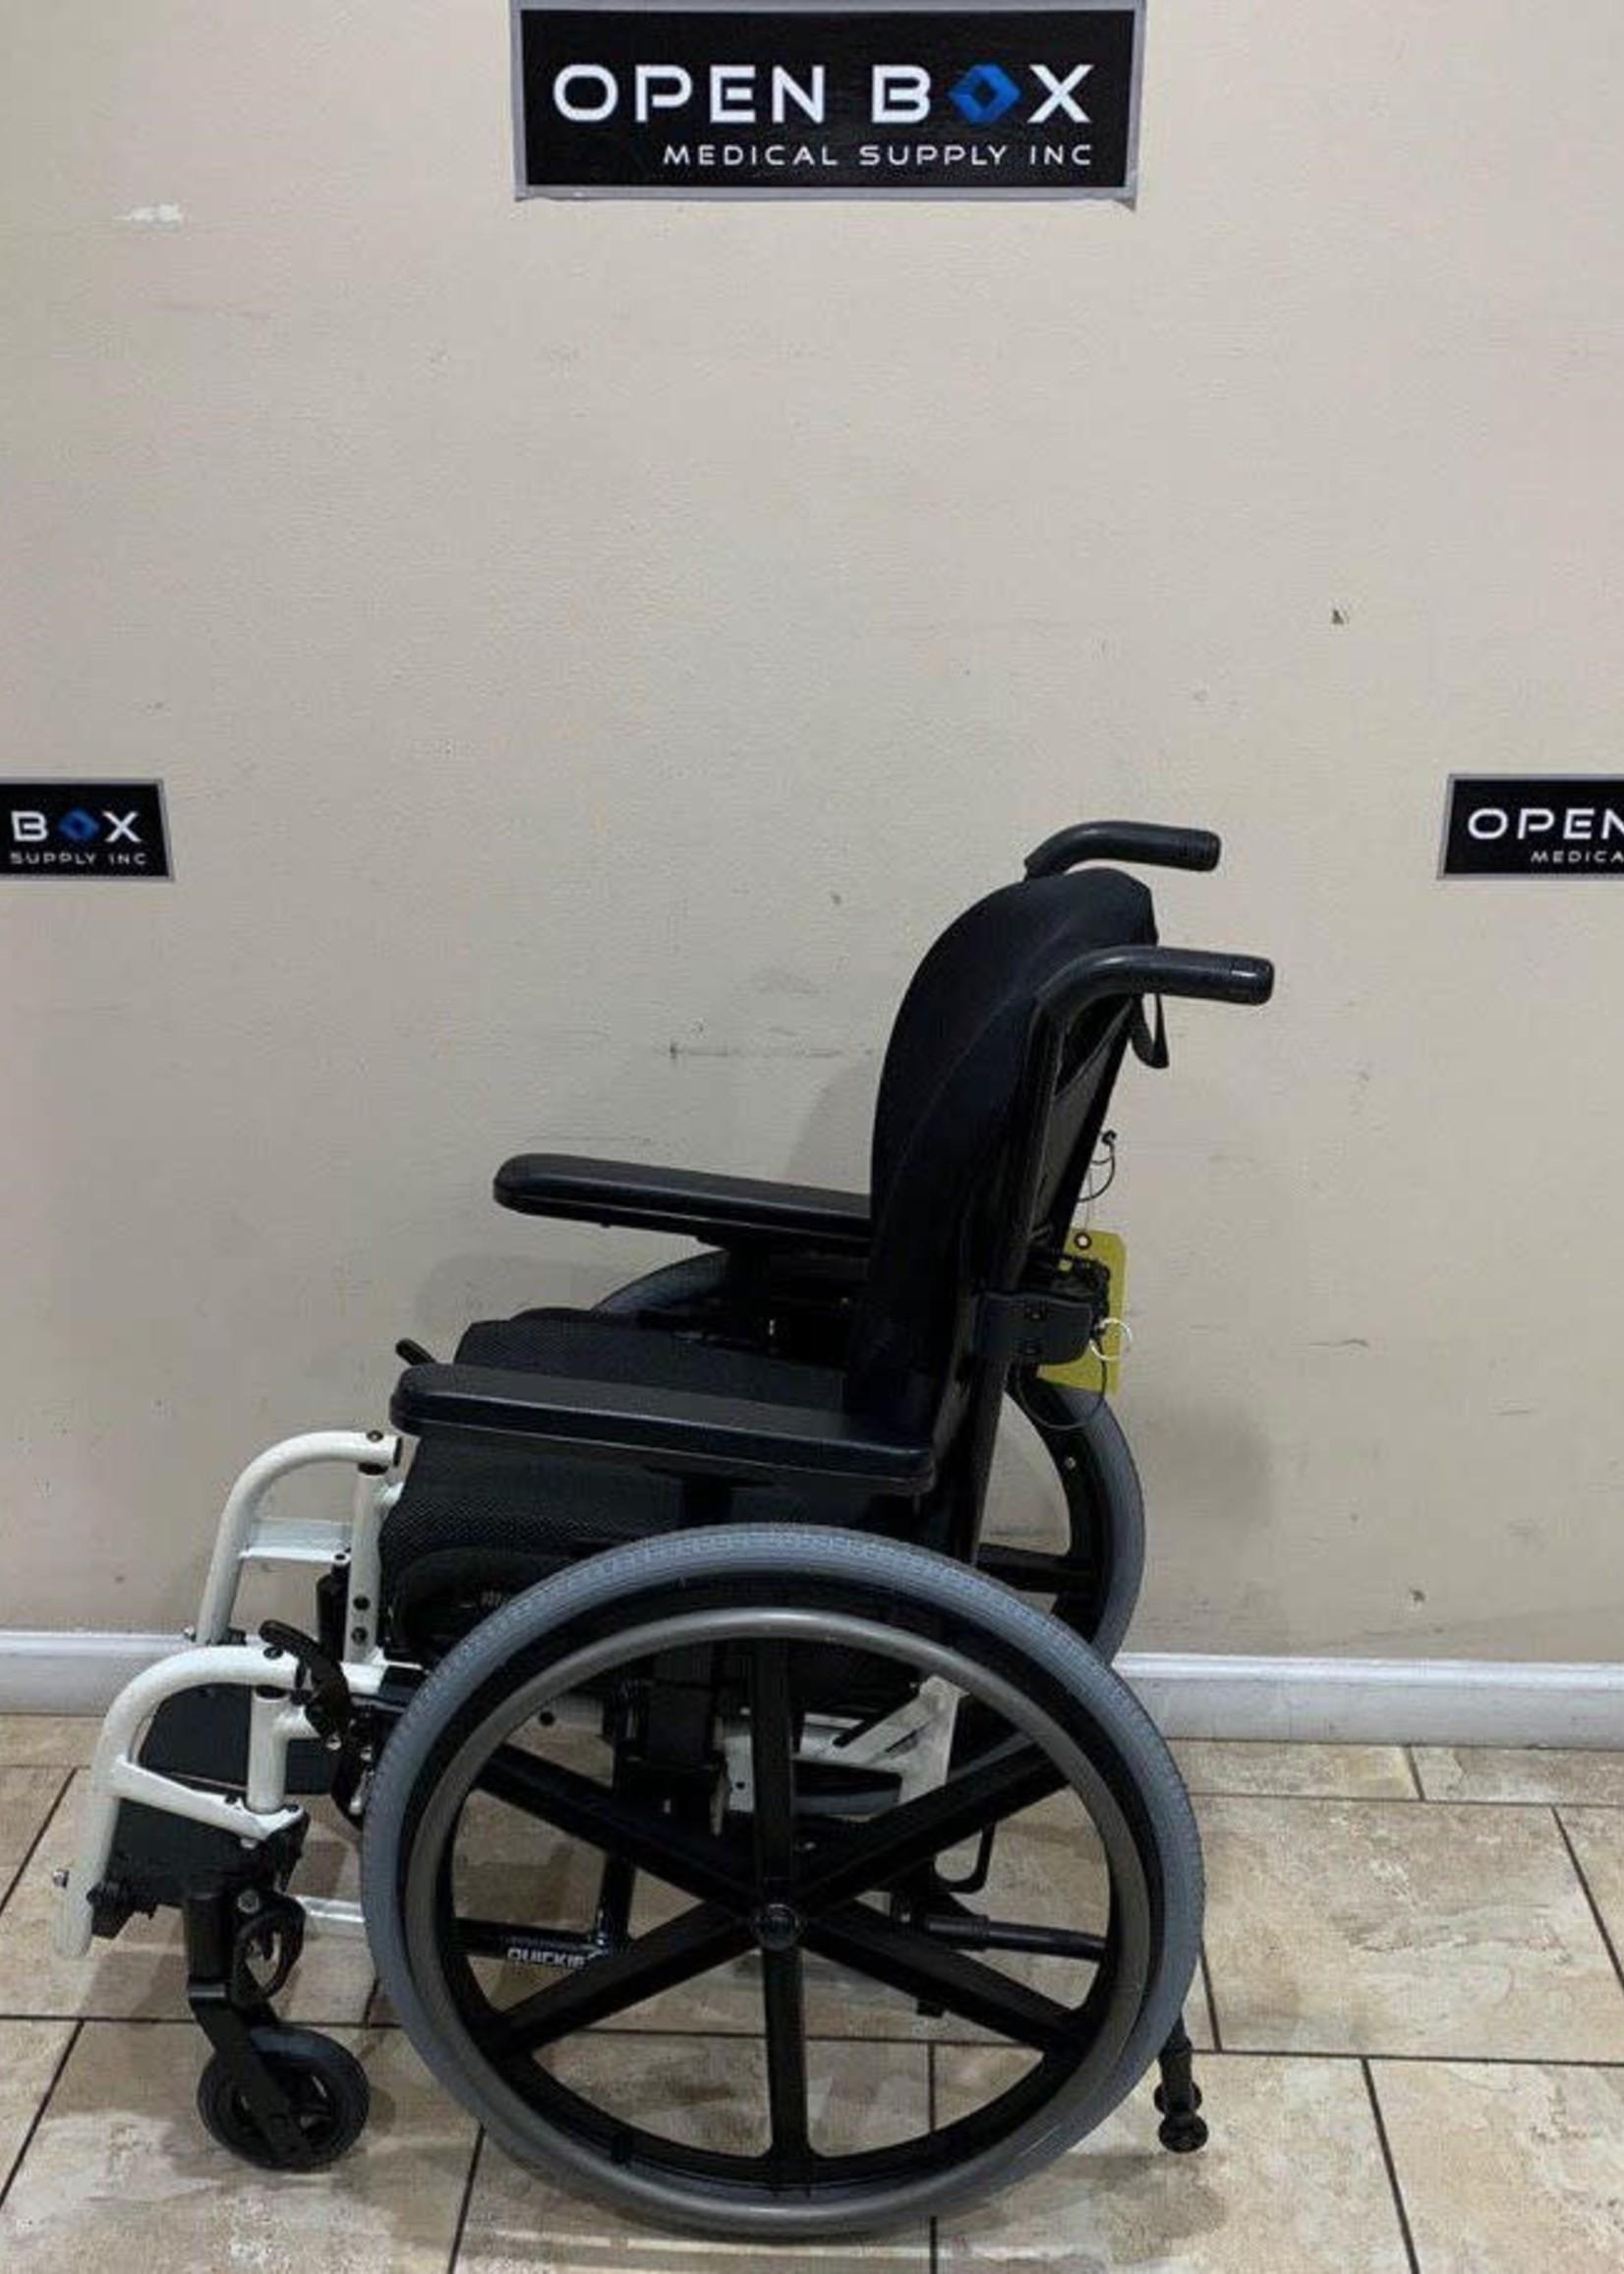 Sunrise Medical Quickie 2 SE Pediatric Manual Ultralight Wheelchair (Used)